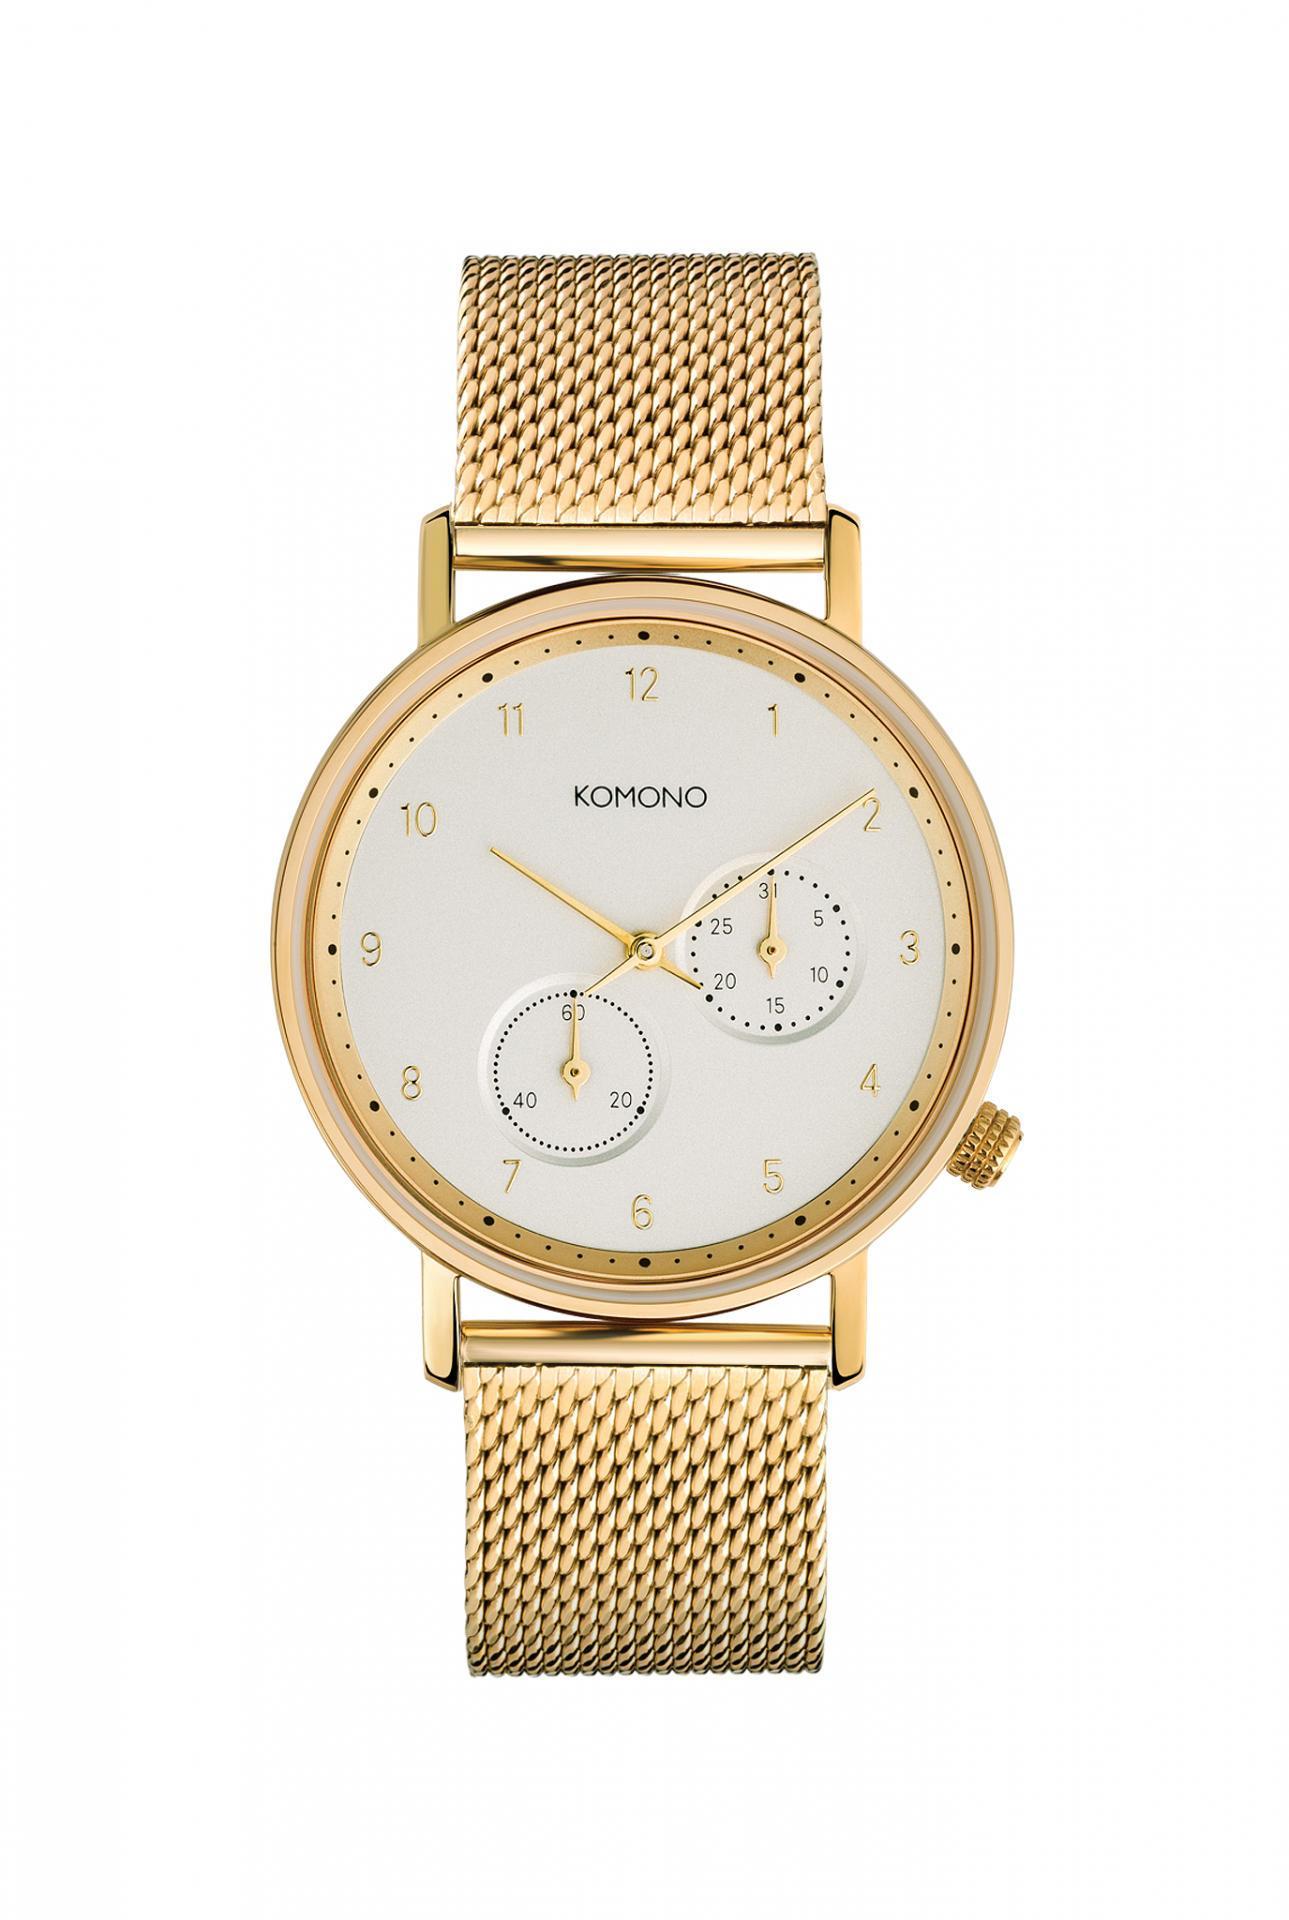 Komono Unisex hodinky Komono Walther Gold Mesh, zlatá barva, kov